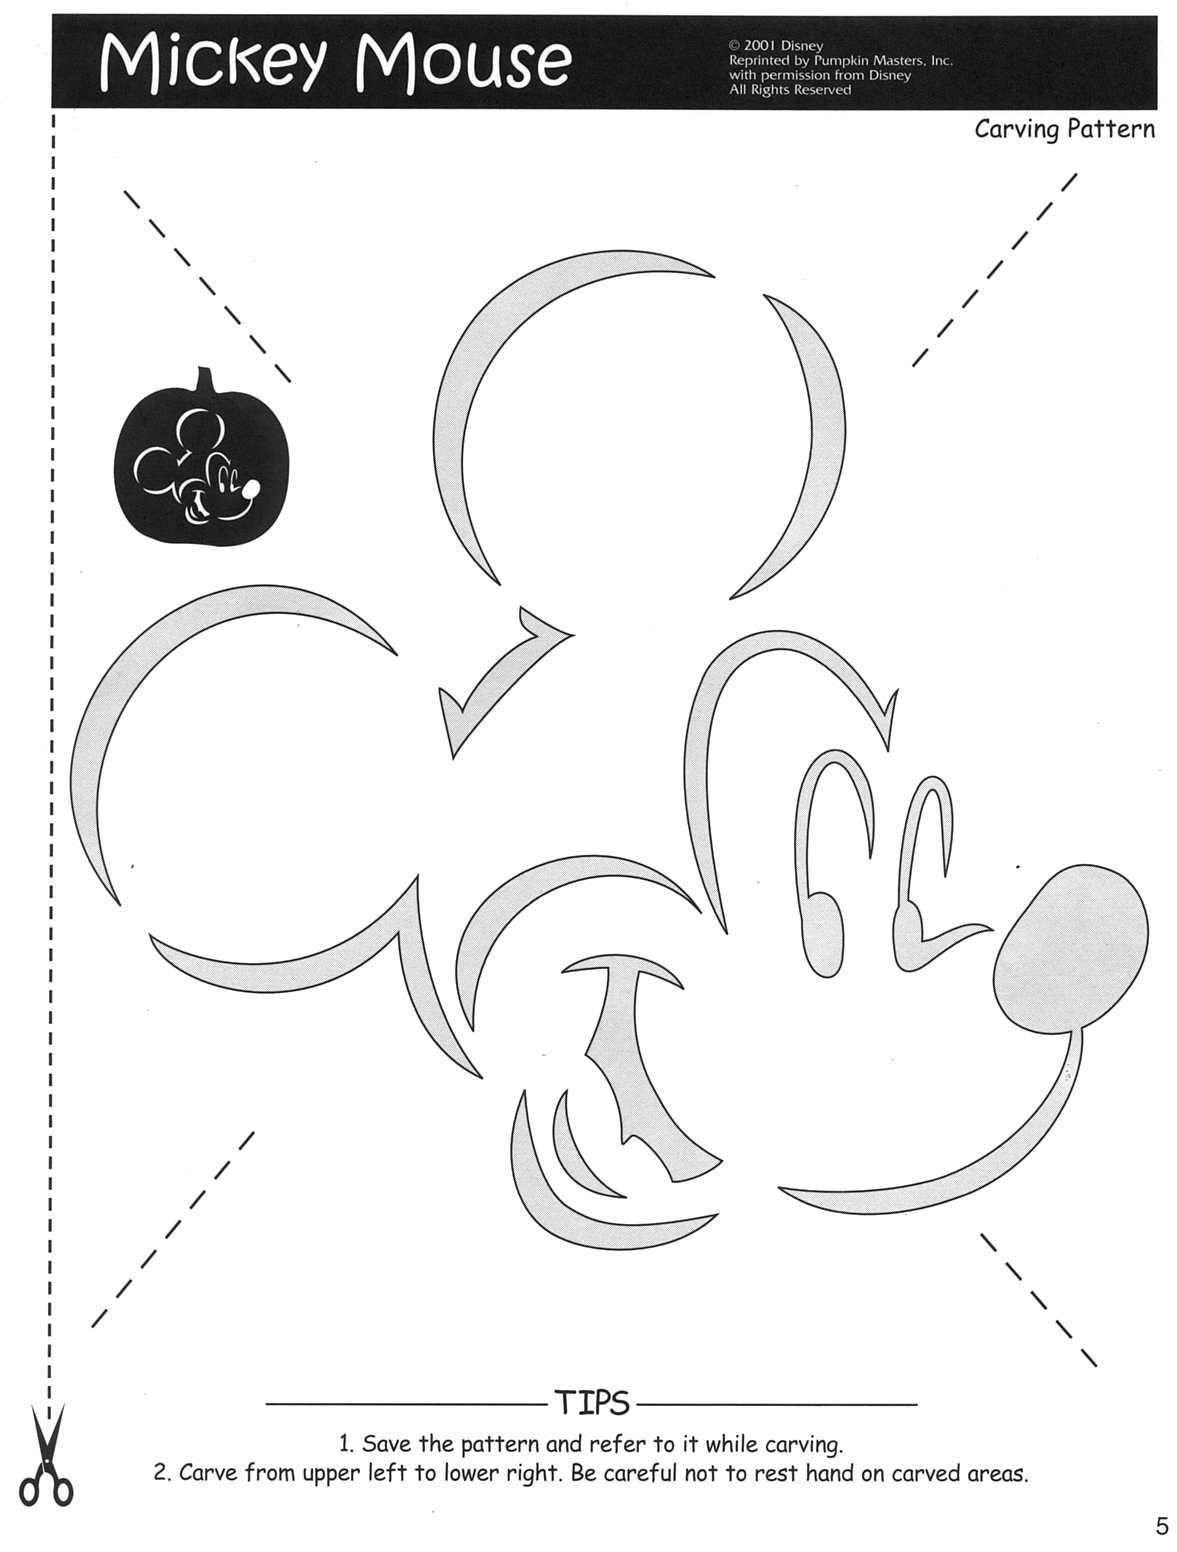 100+ Disney Halloween Pumpkin Carving Stencil Templates w/ Images ...